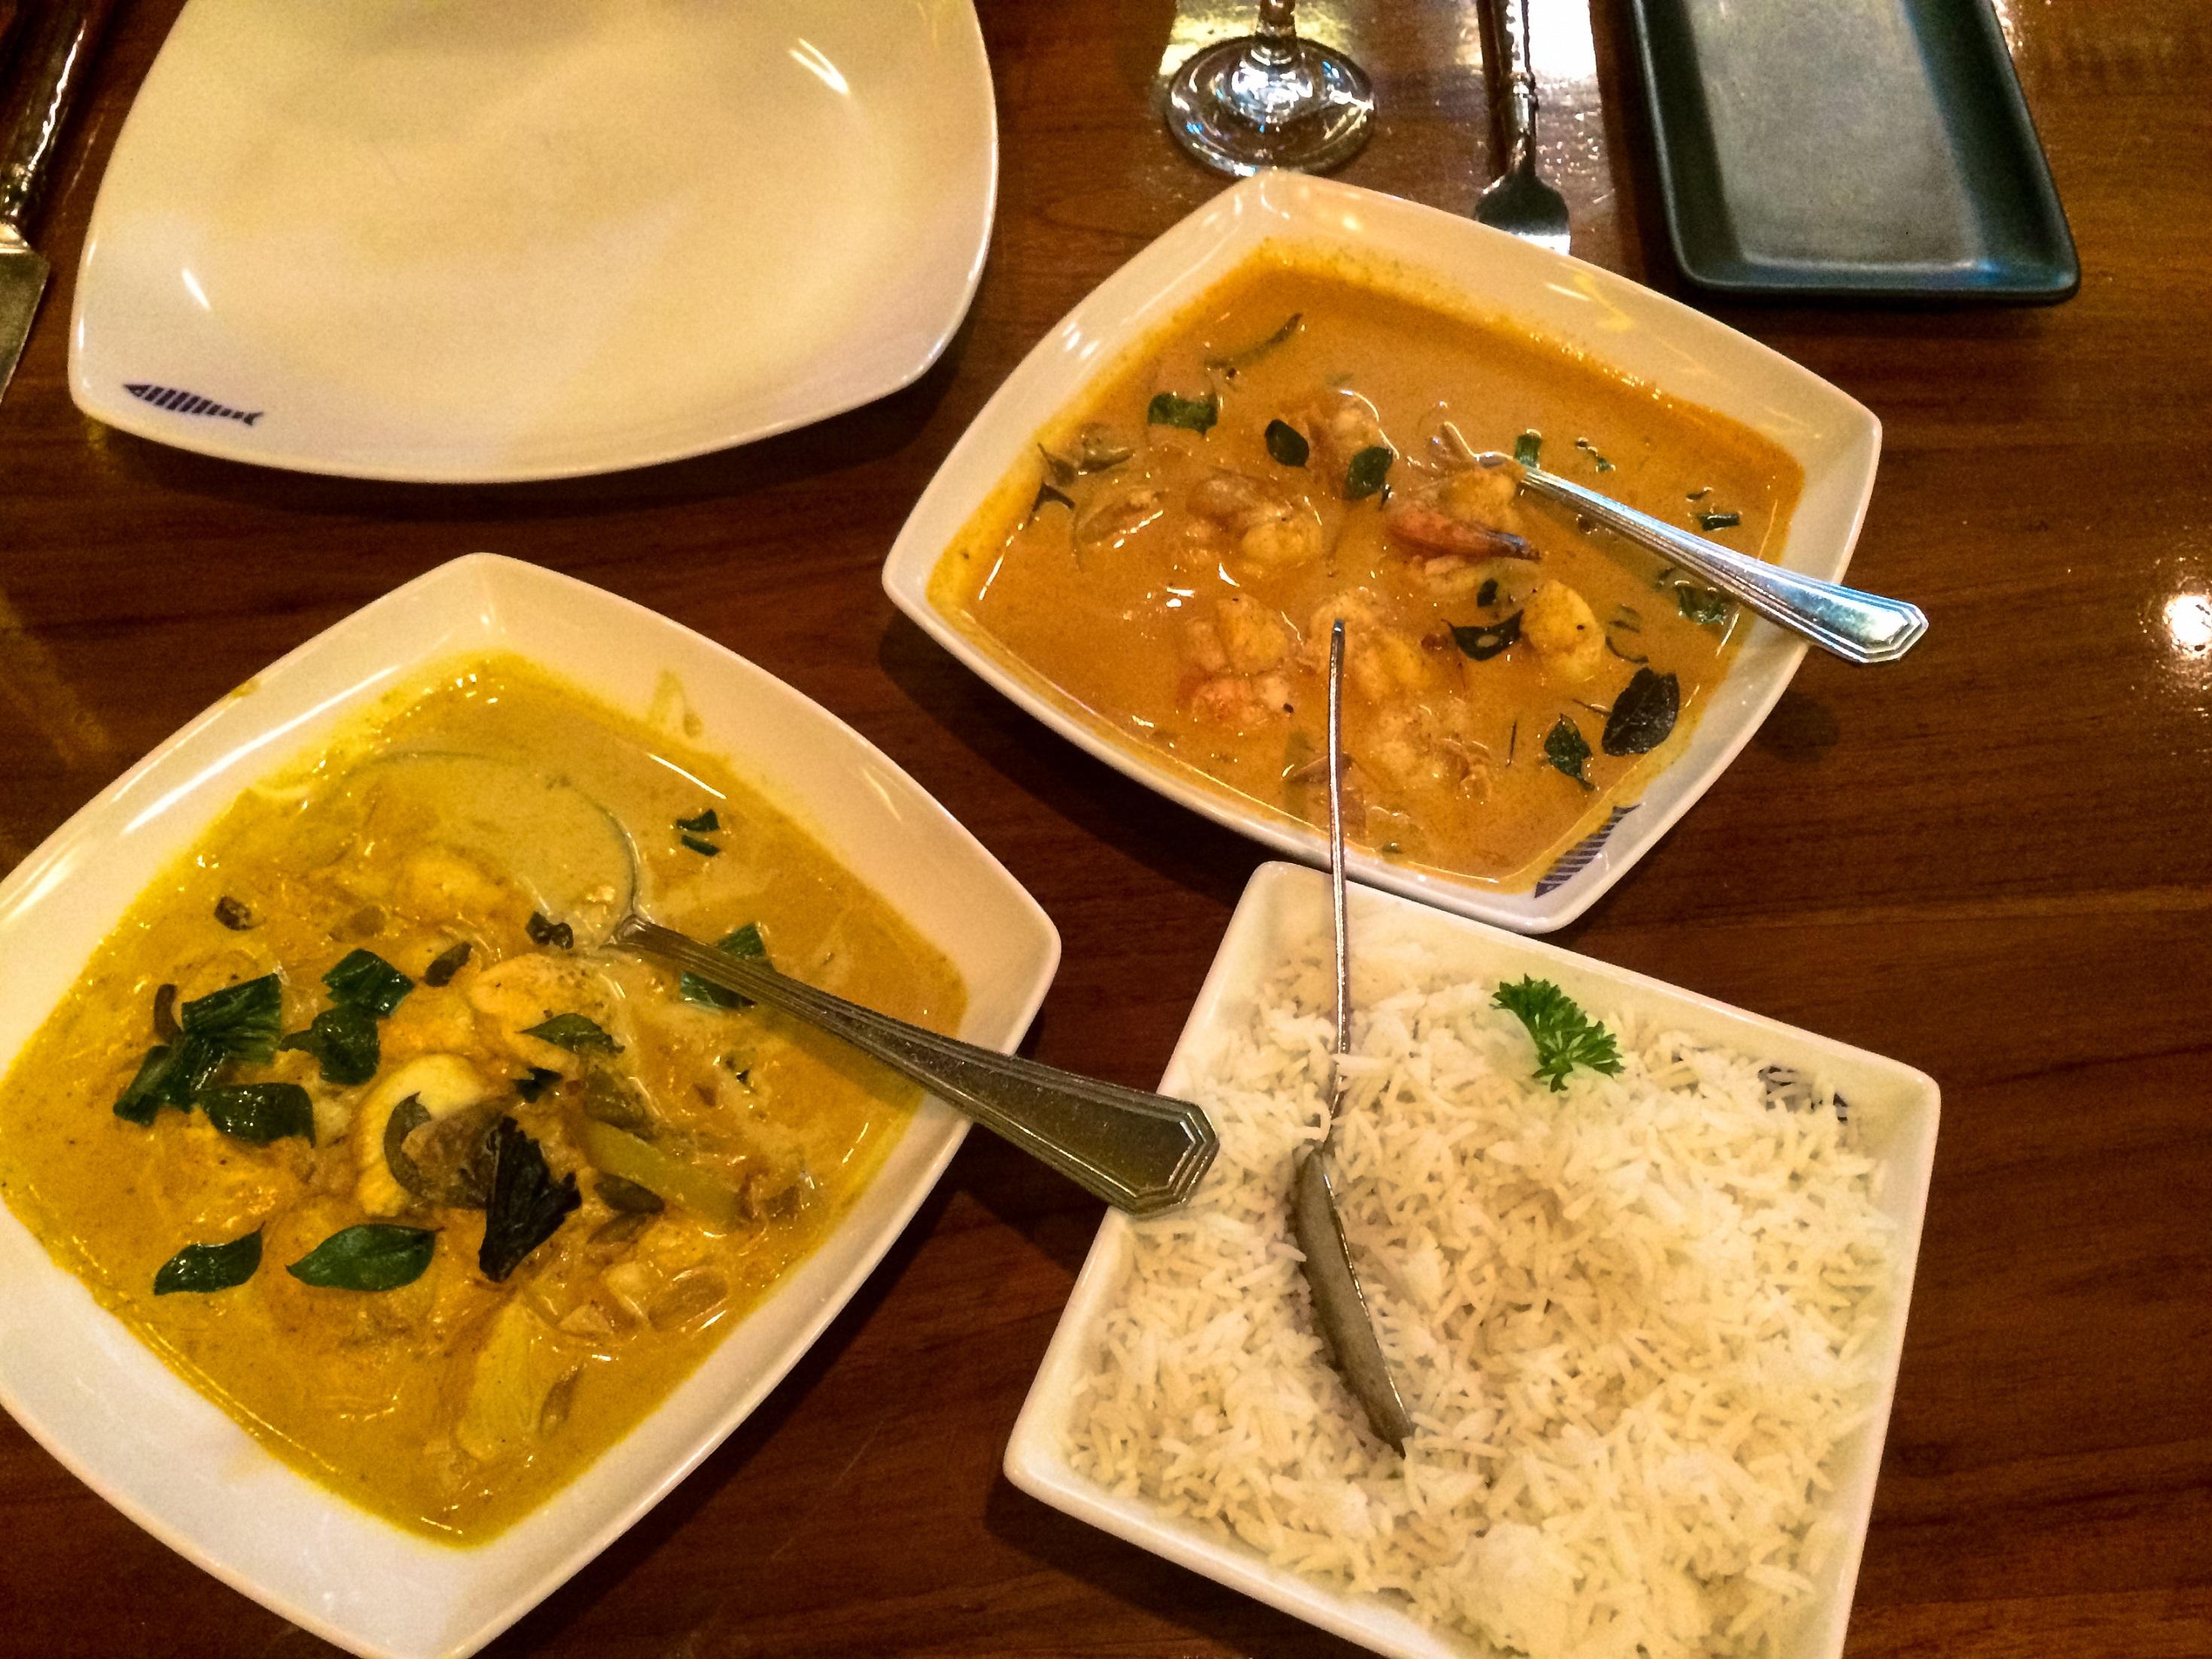 Sri Lankan curries